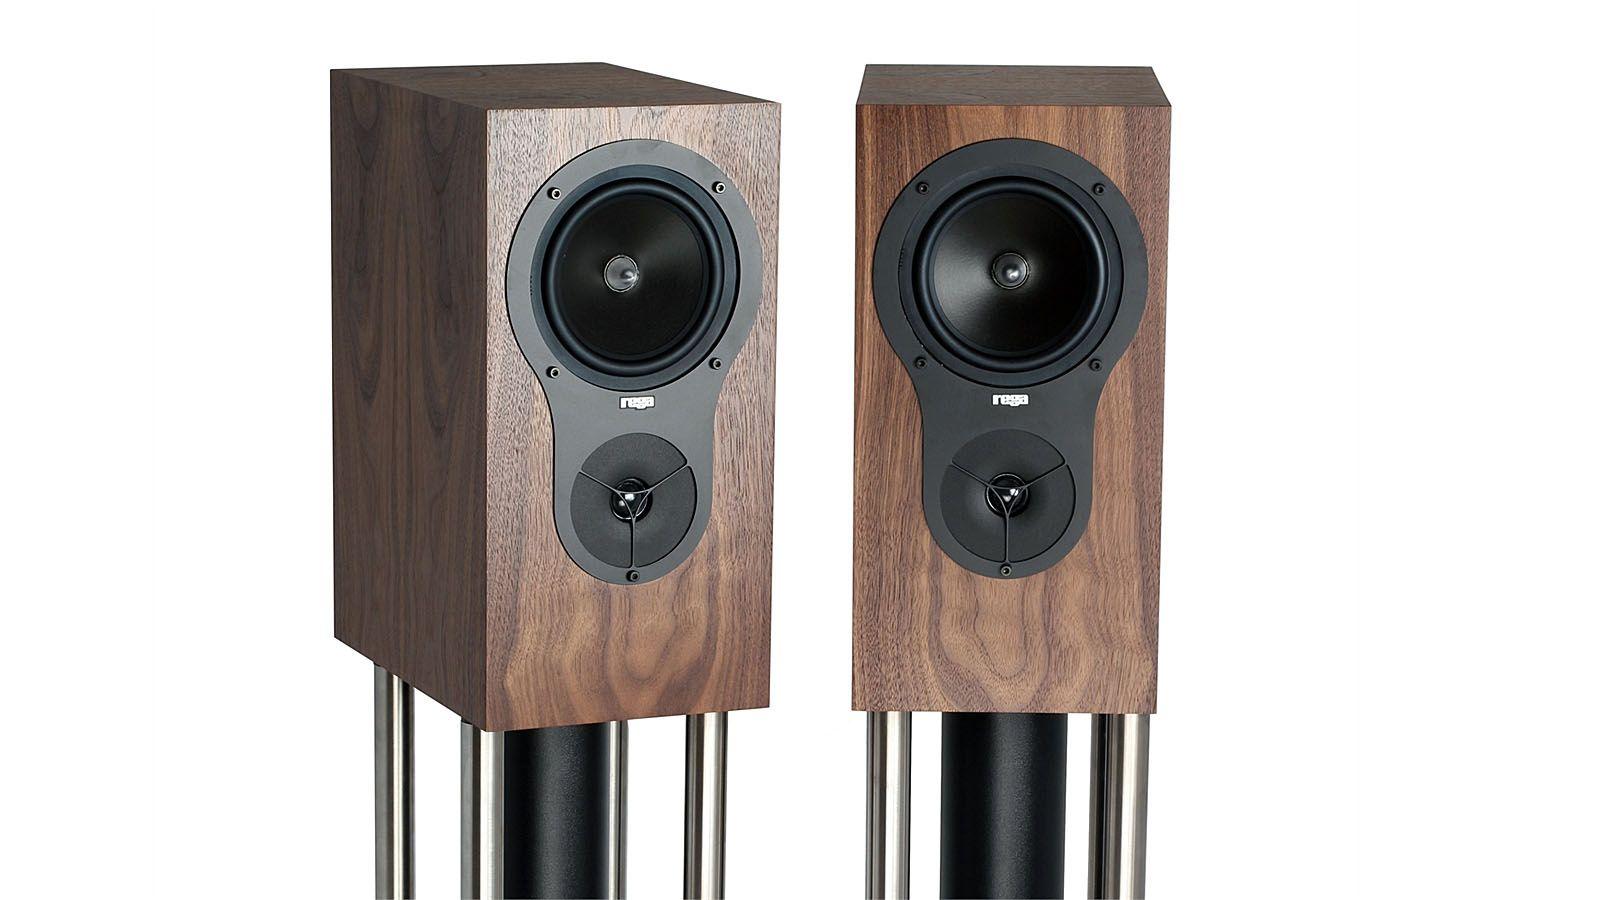 rega rx 1 kompaktlautsprecher neu bei audio creativ lautsprecher audio und kompaktlautsprecher. Black Bedroom Furniture Sets. Home Design Ideas